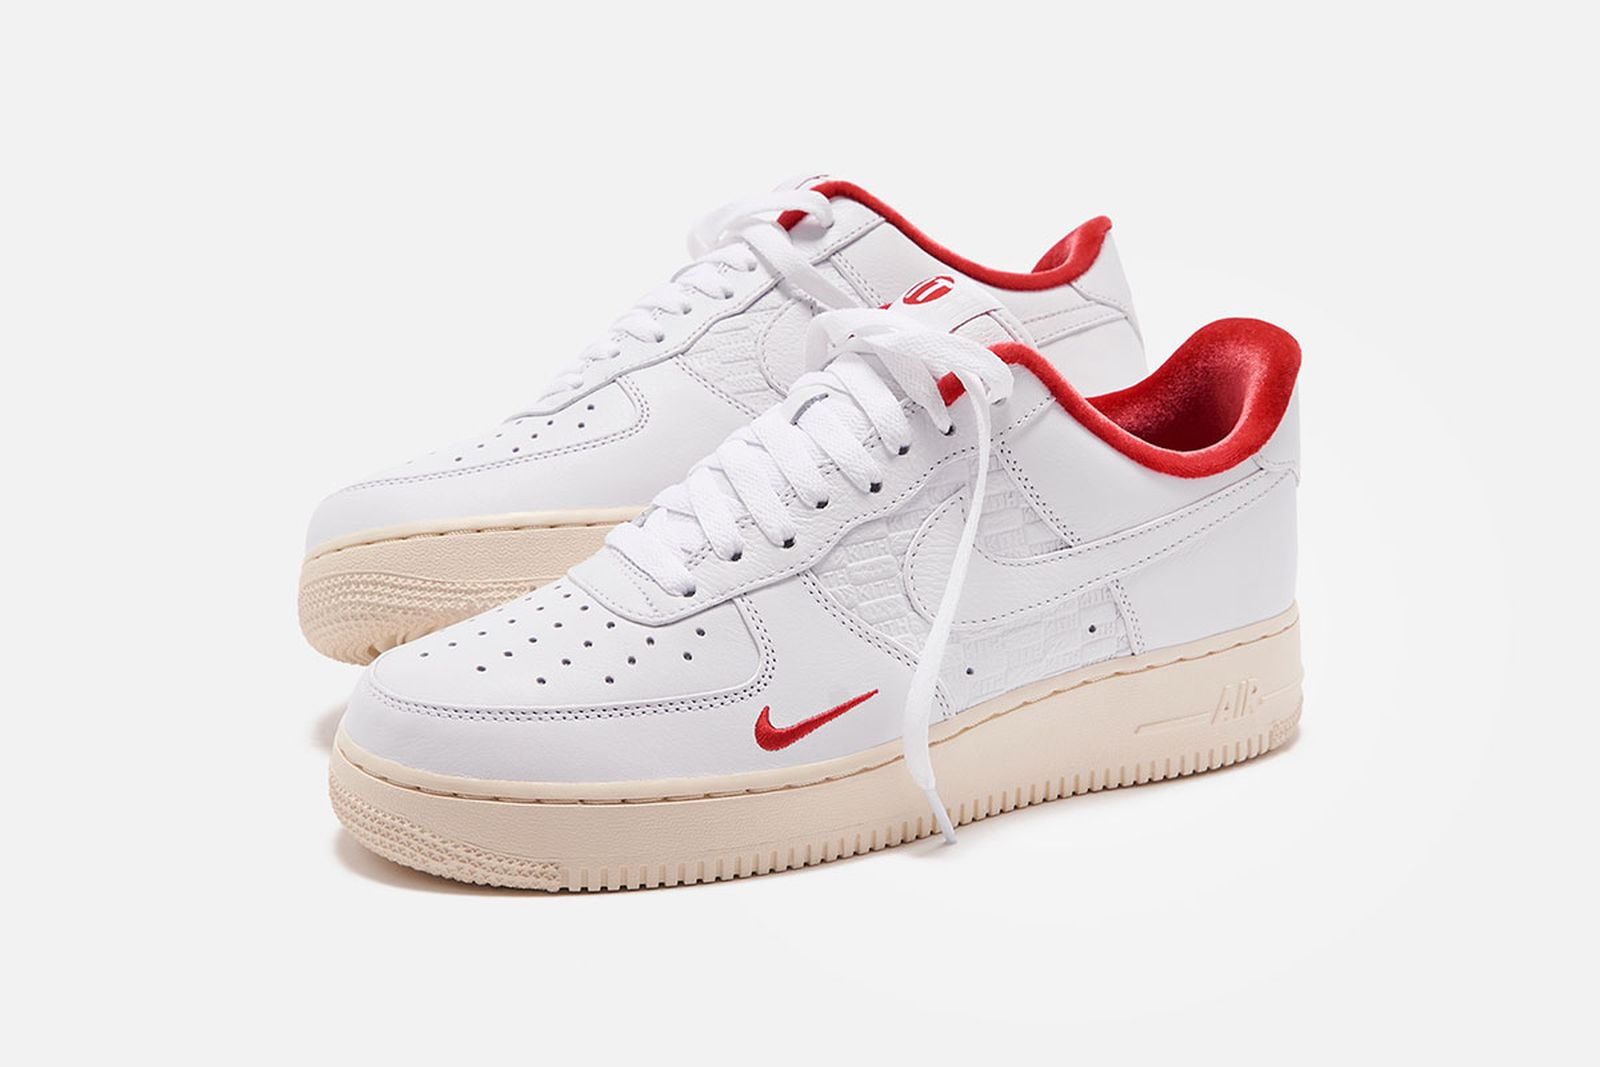 Kith x Nike Air Force 1 Tokyo